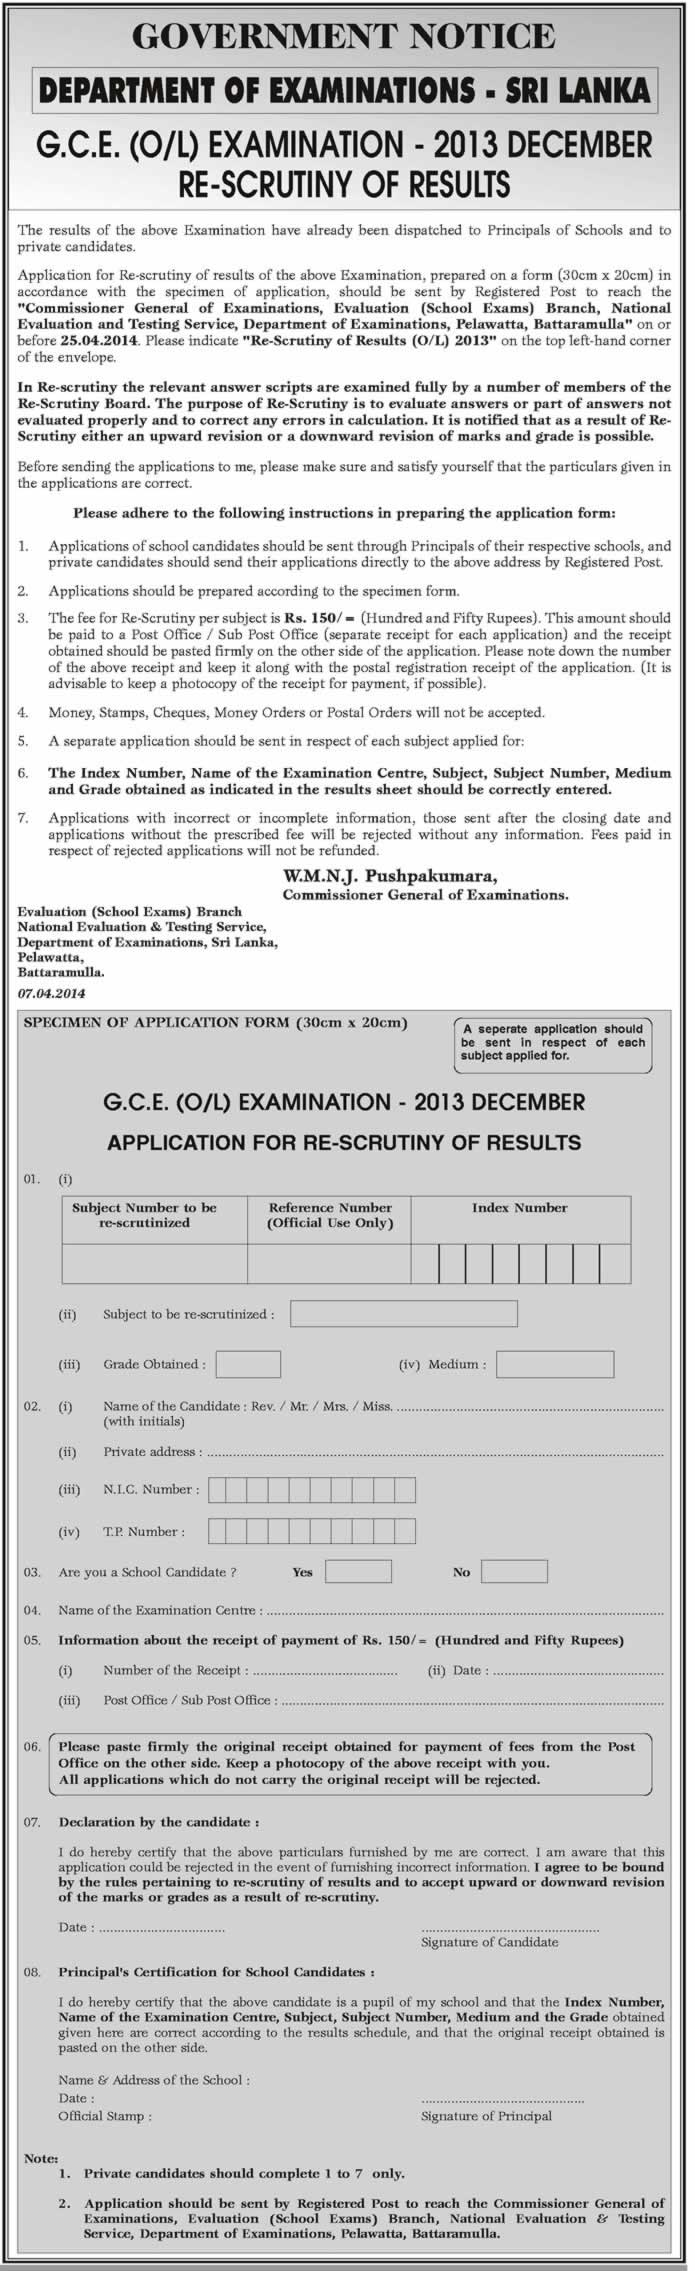 department of examination of sri lanka was